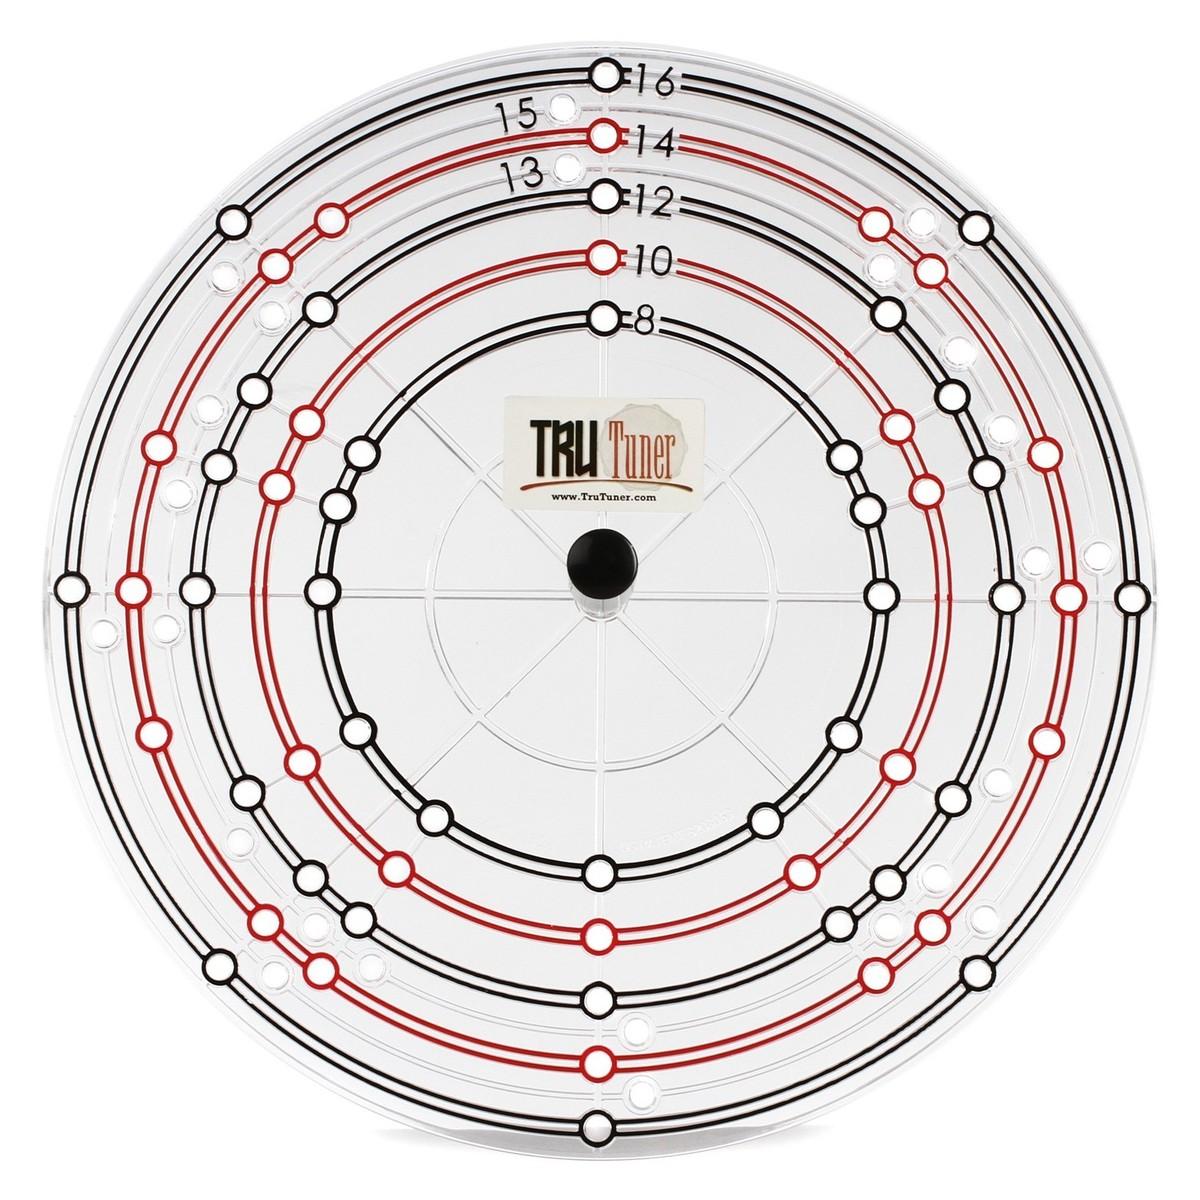 Drum Head Replacement Tips : tru tuner rapid drum head replacement system at gear4music ~ Russianpoet.info Haus und Dekorationen